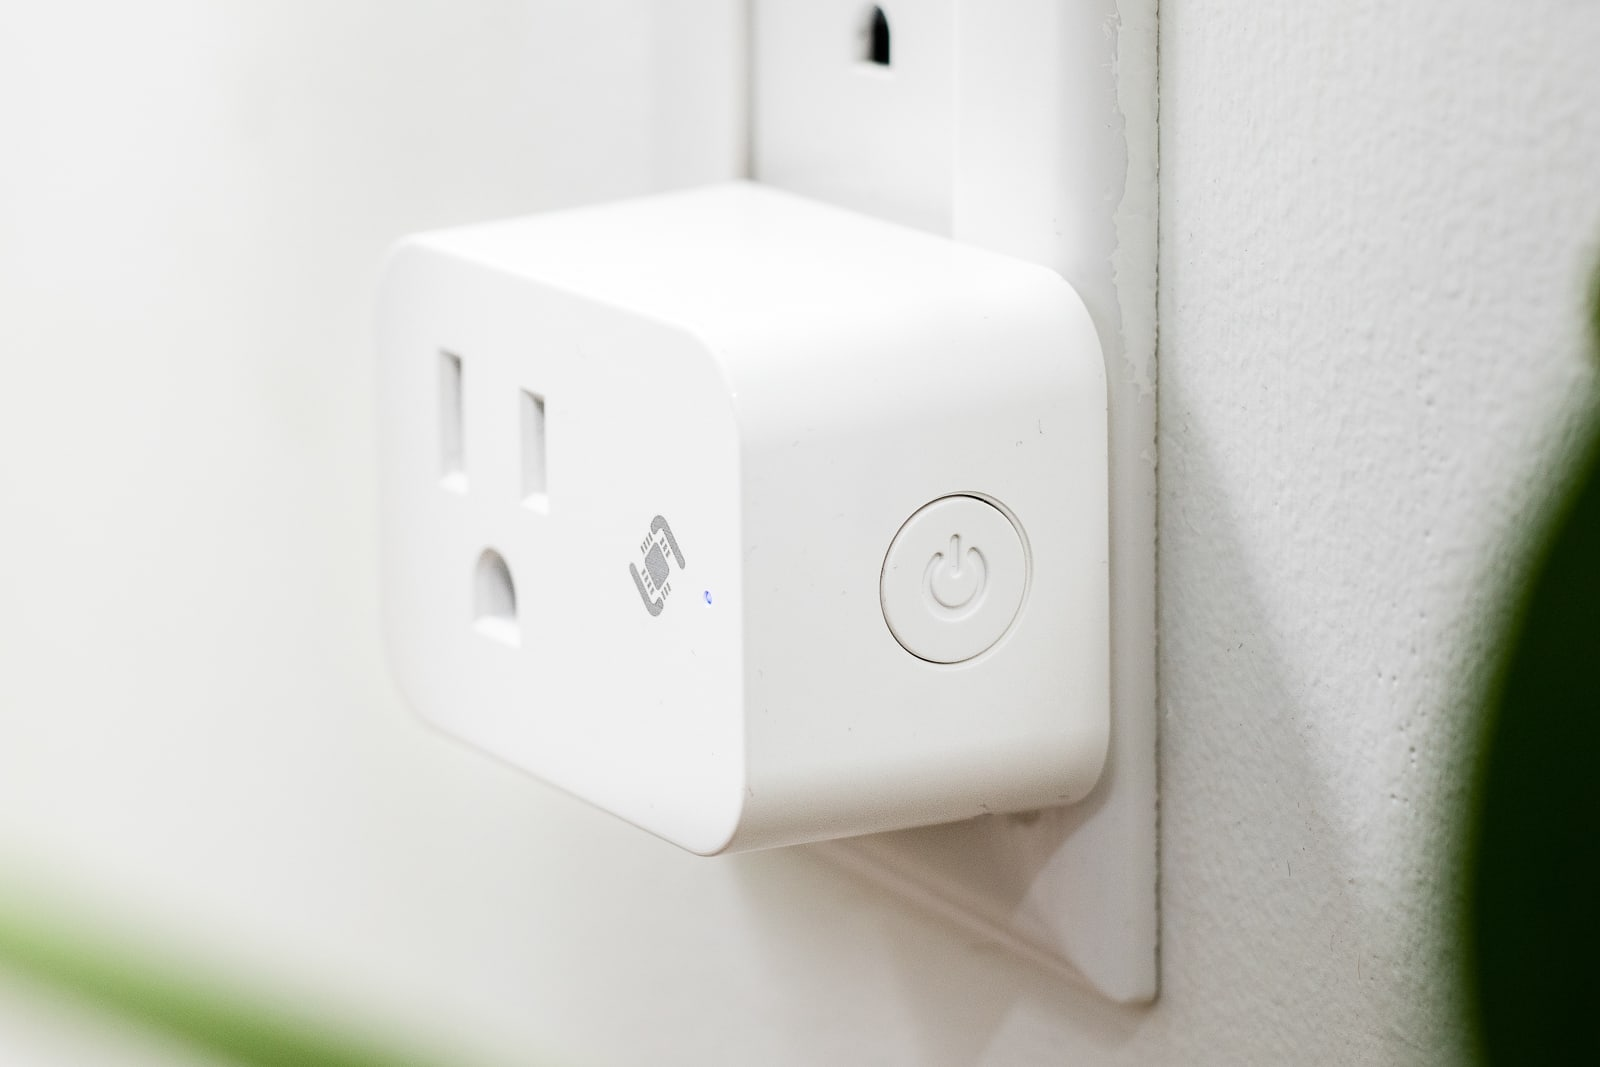 Plug-in smart outlet